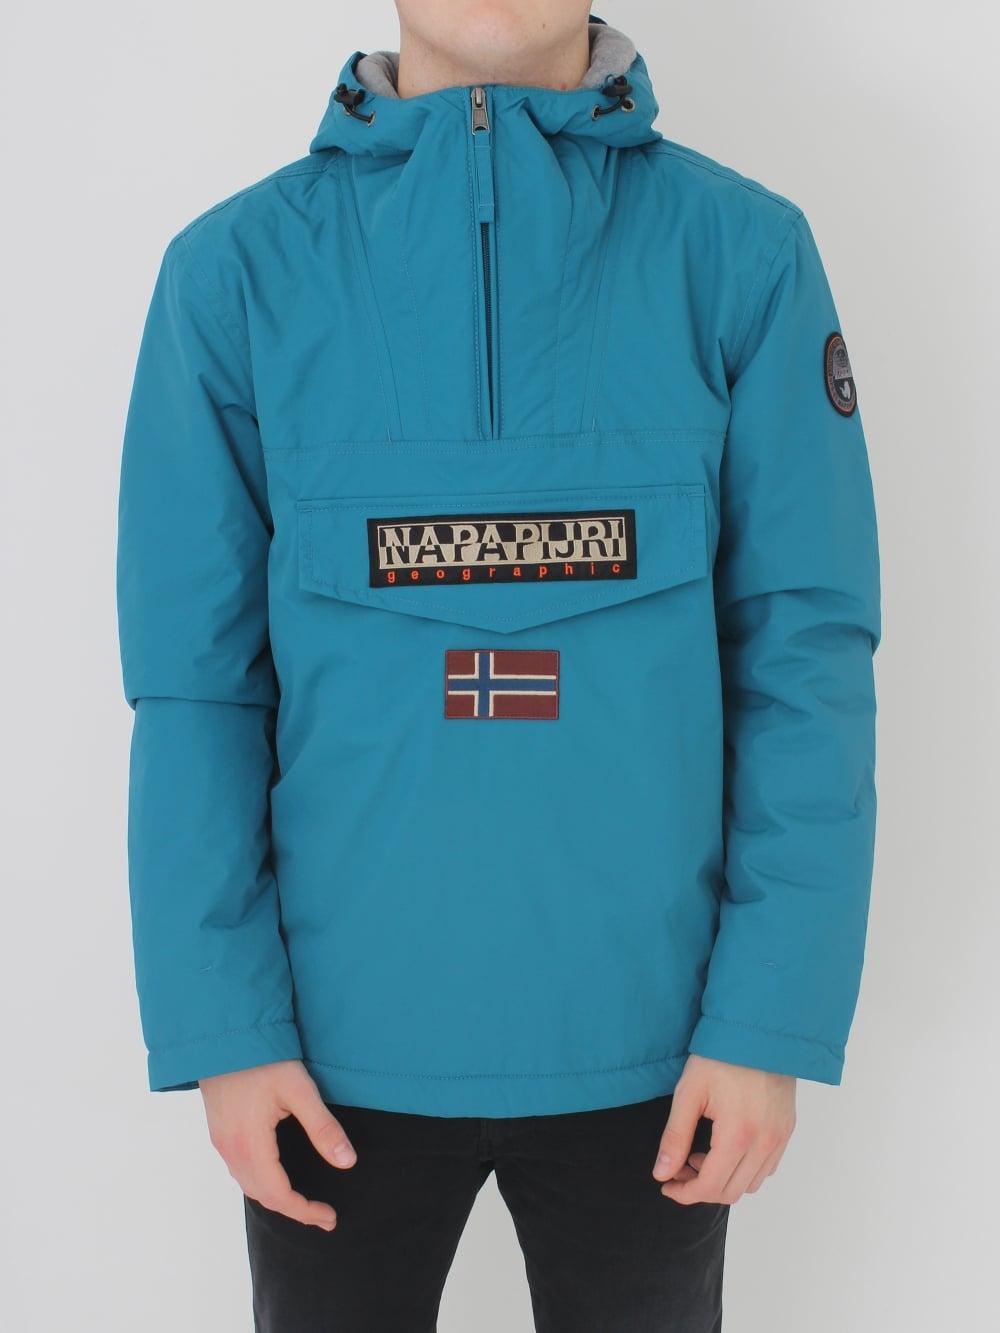 Napapijri Rainforest Winter Jacket in Deep Jade - Northern Threads 45863f2bc126